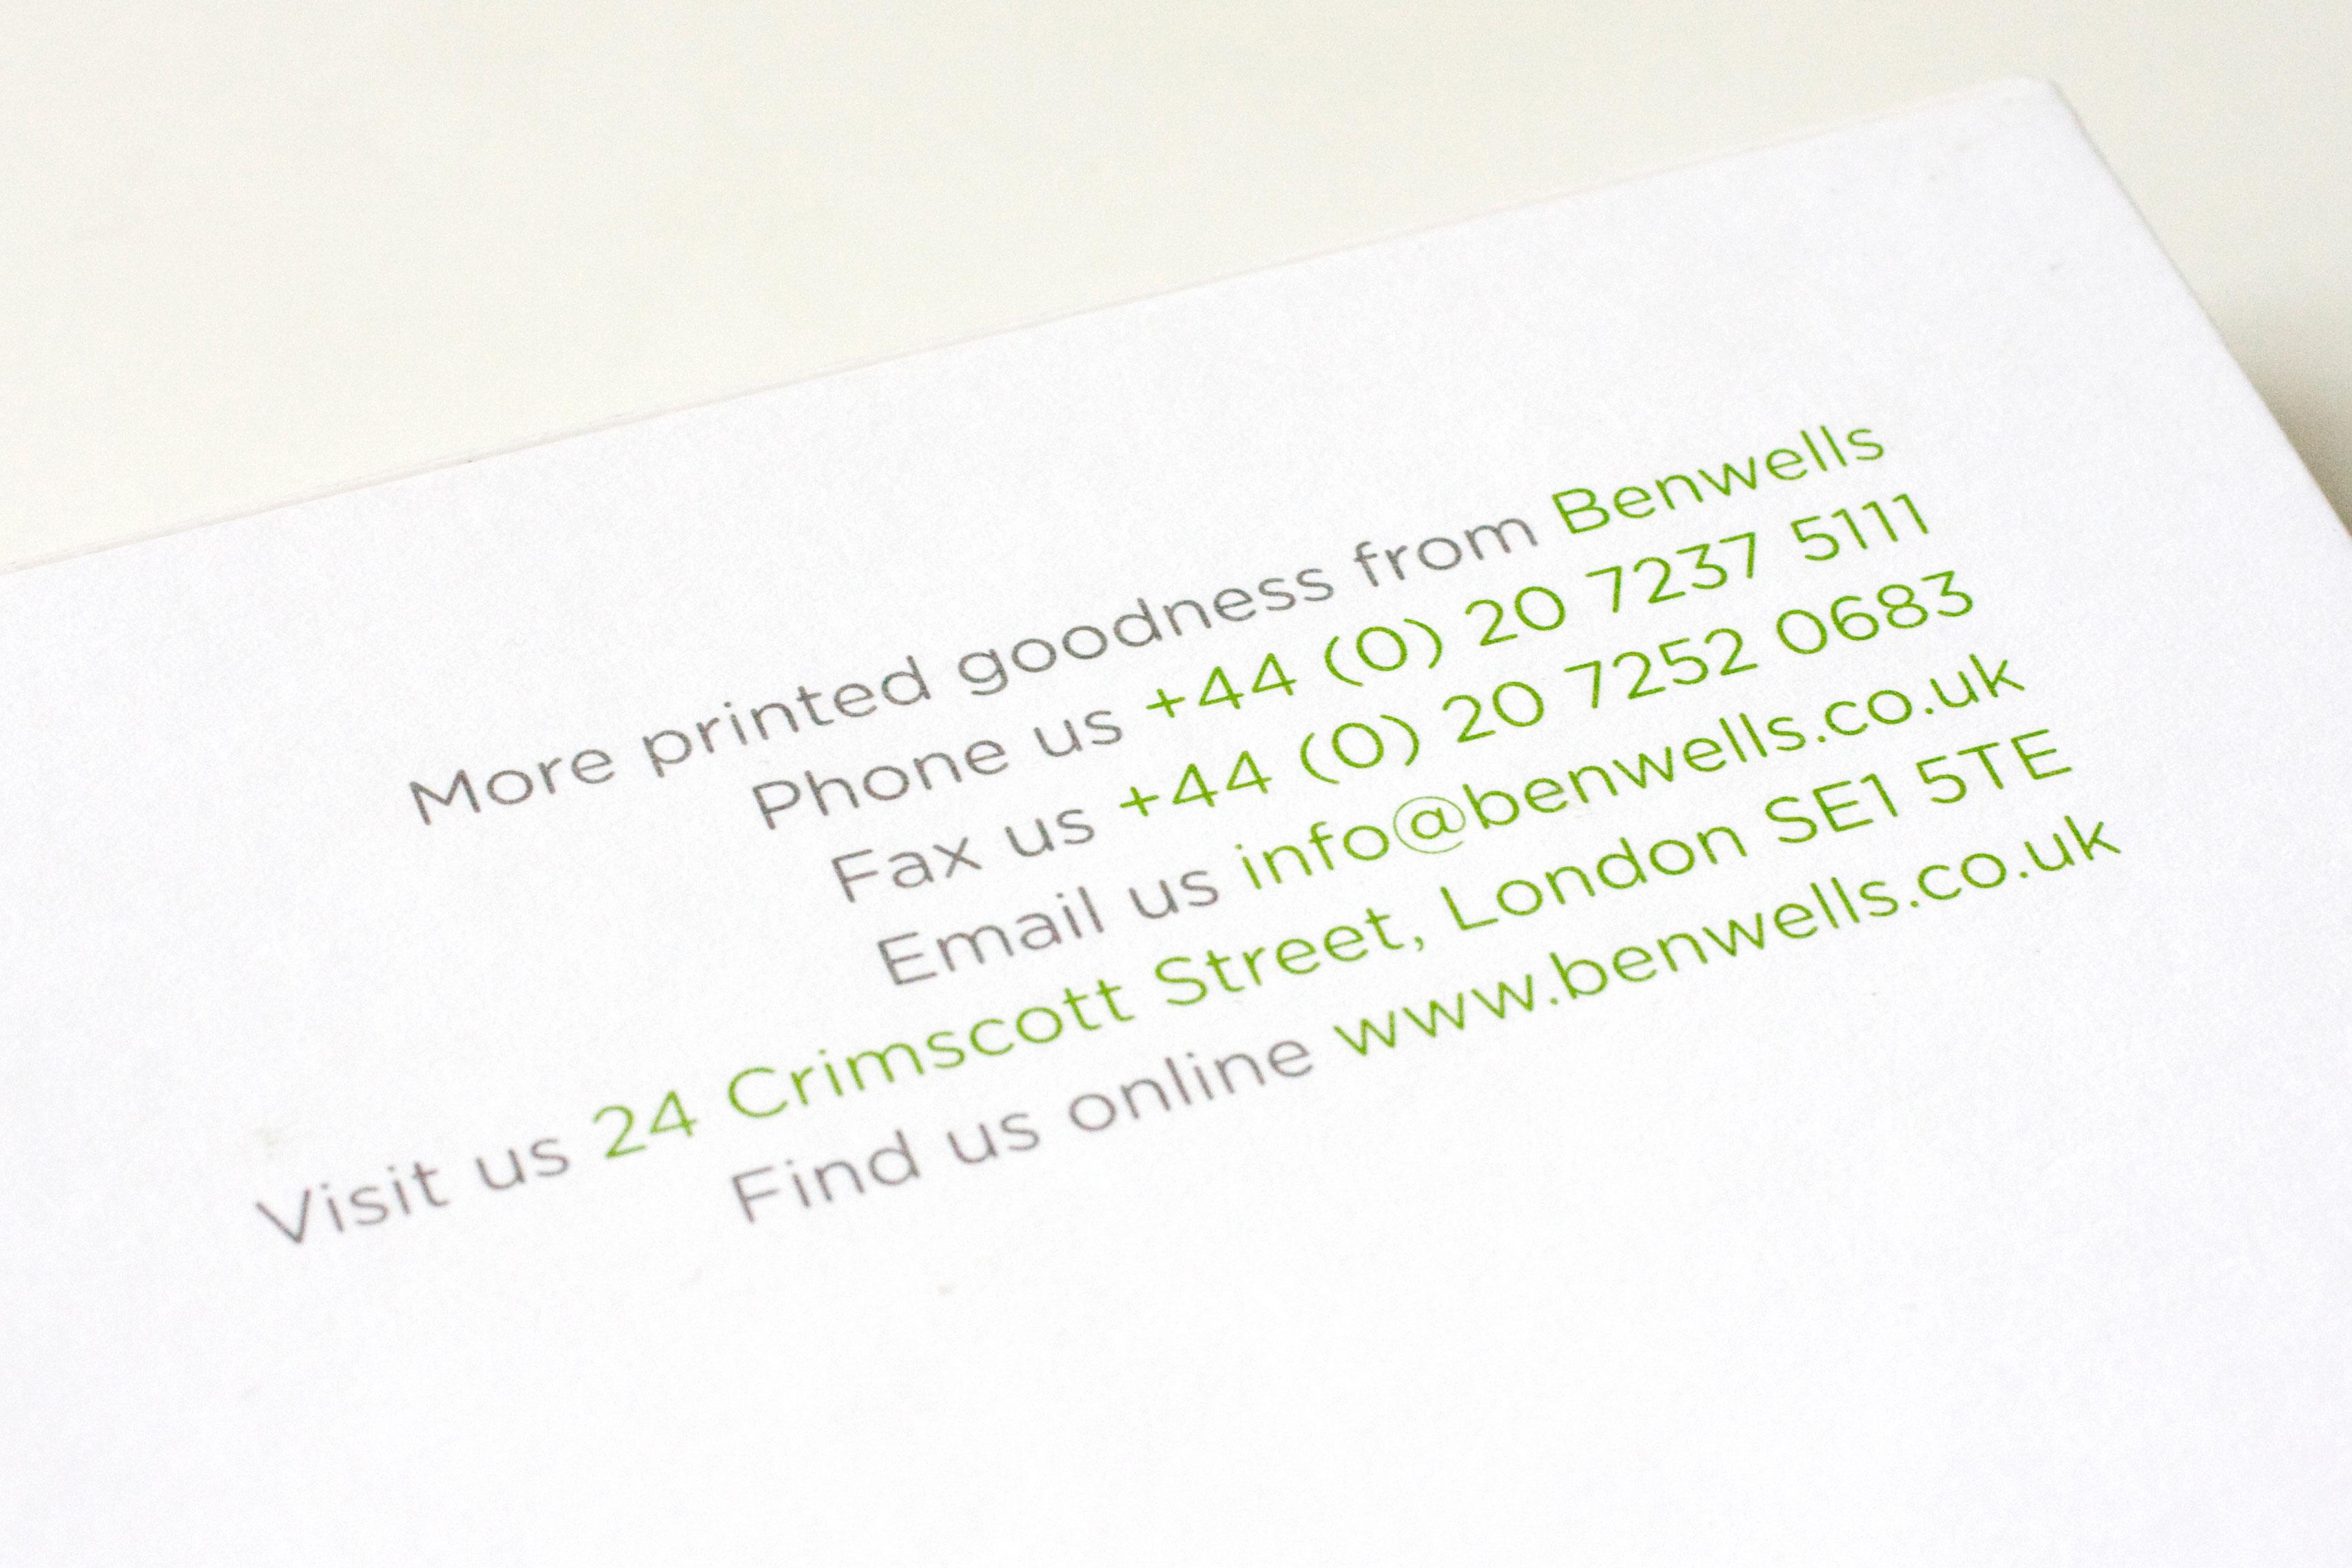 Benwells-text